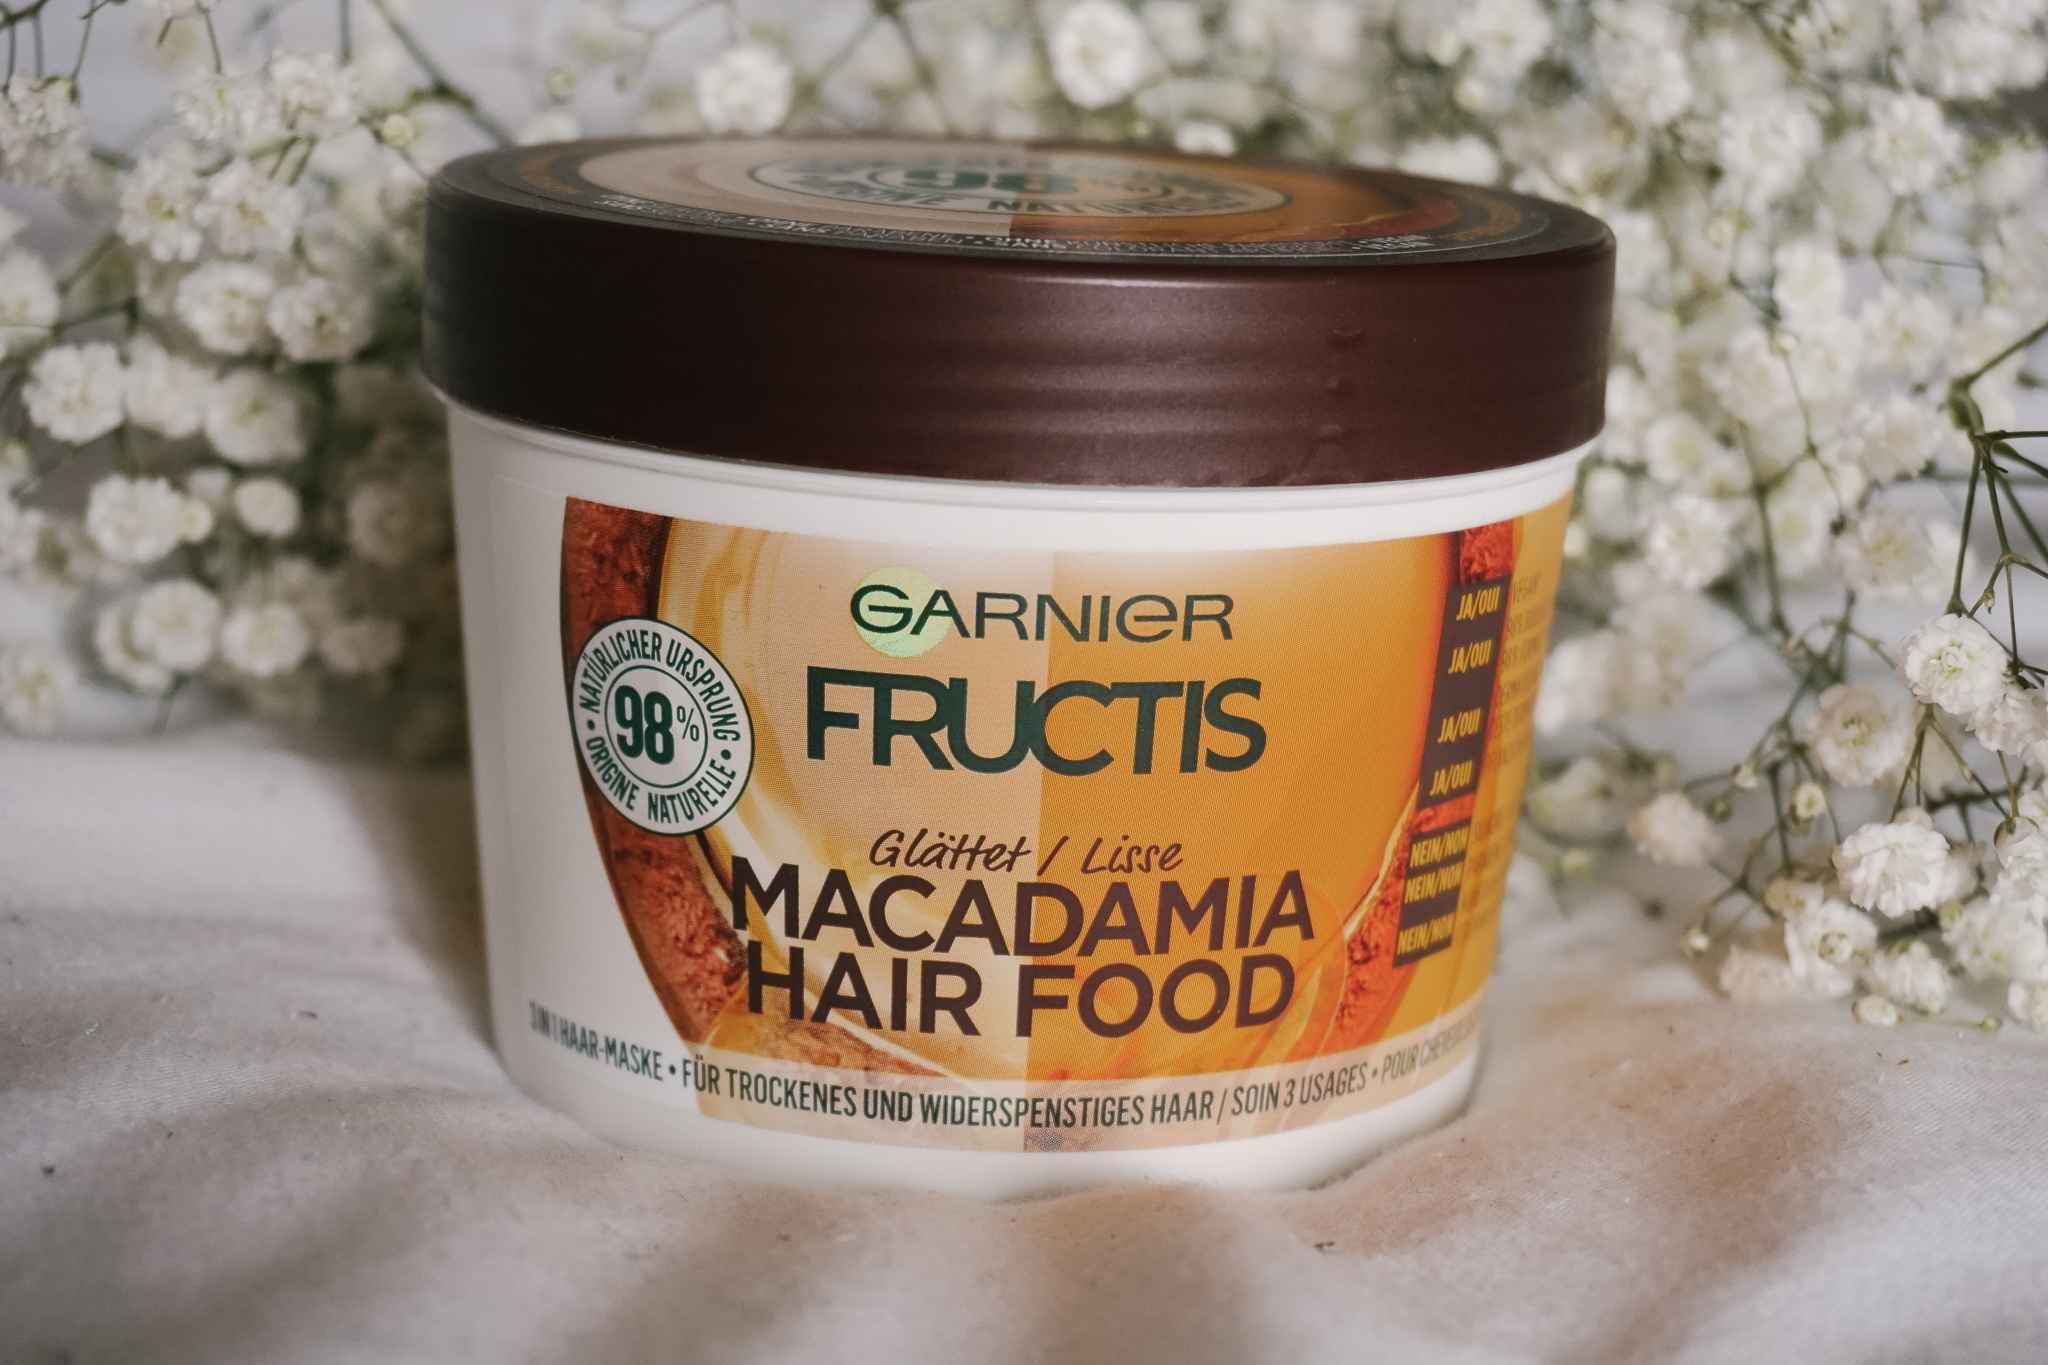 fructis garnier hair food